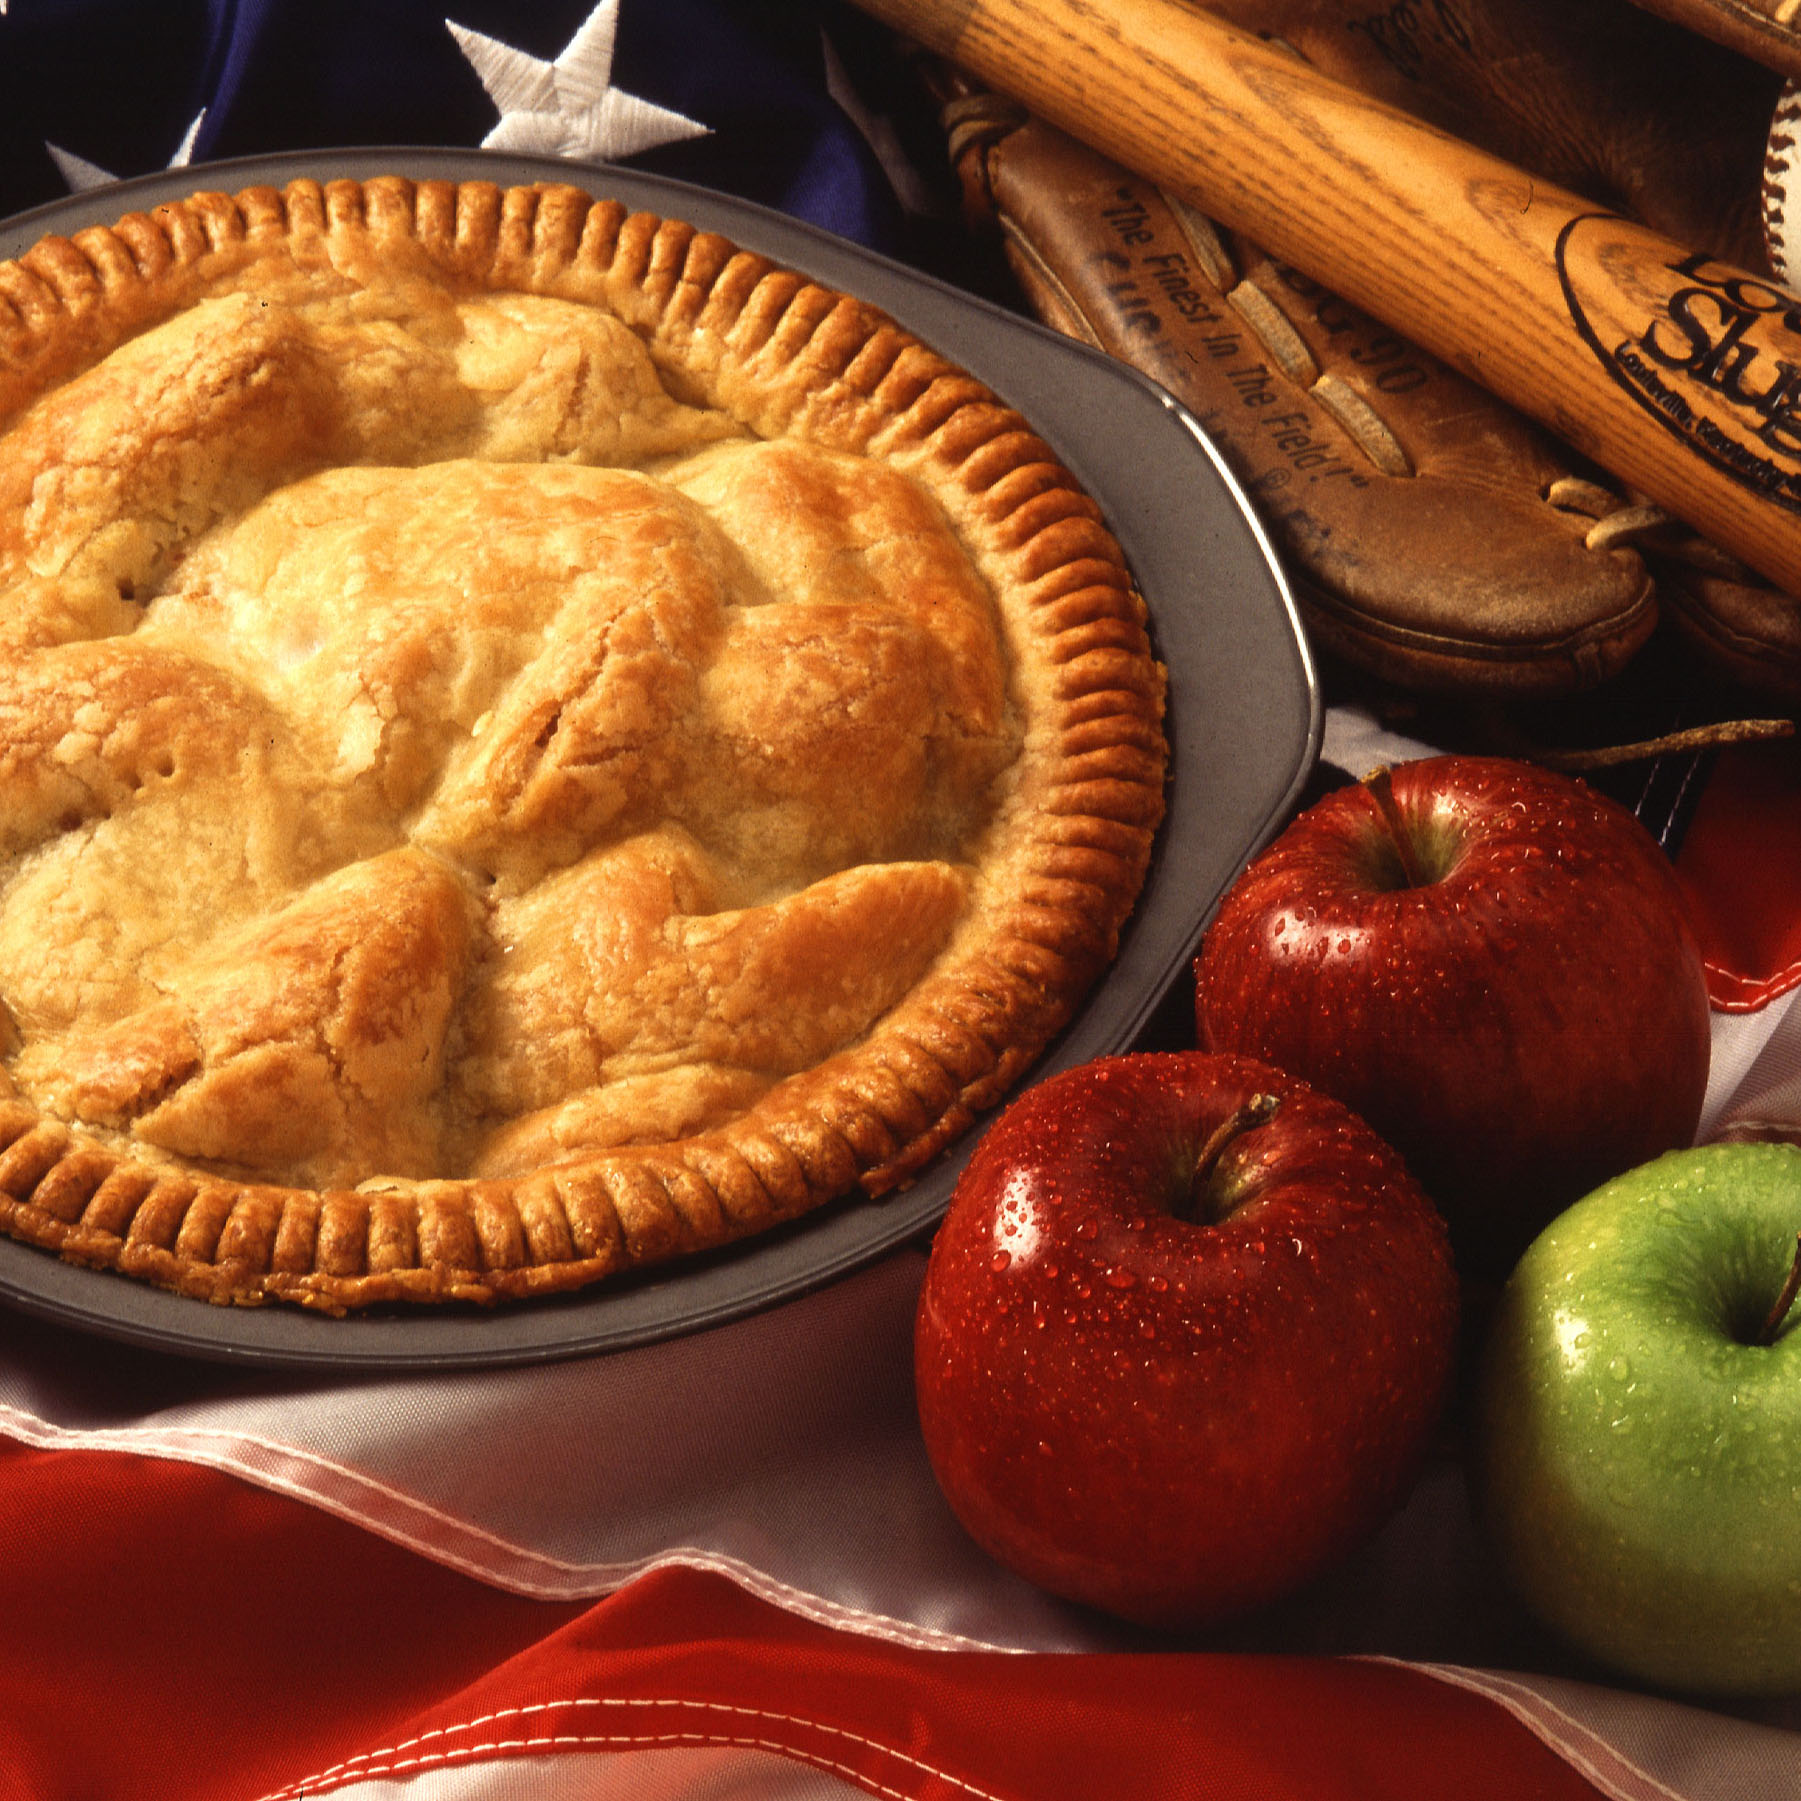 Motherhood_and_apple_pie.jpg: Scott Bauerderivative work: Gesalbte / Public domain